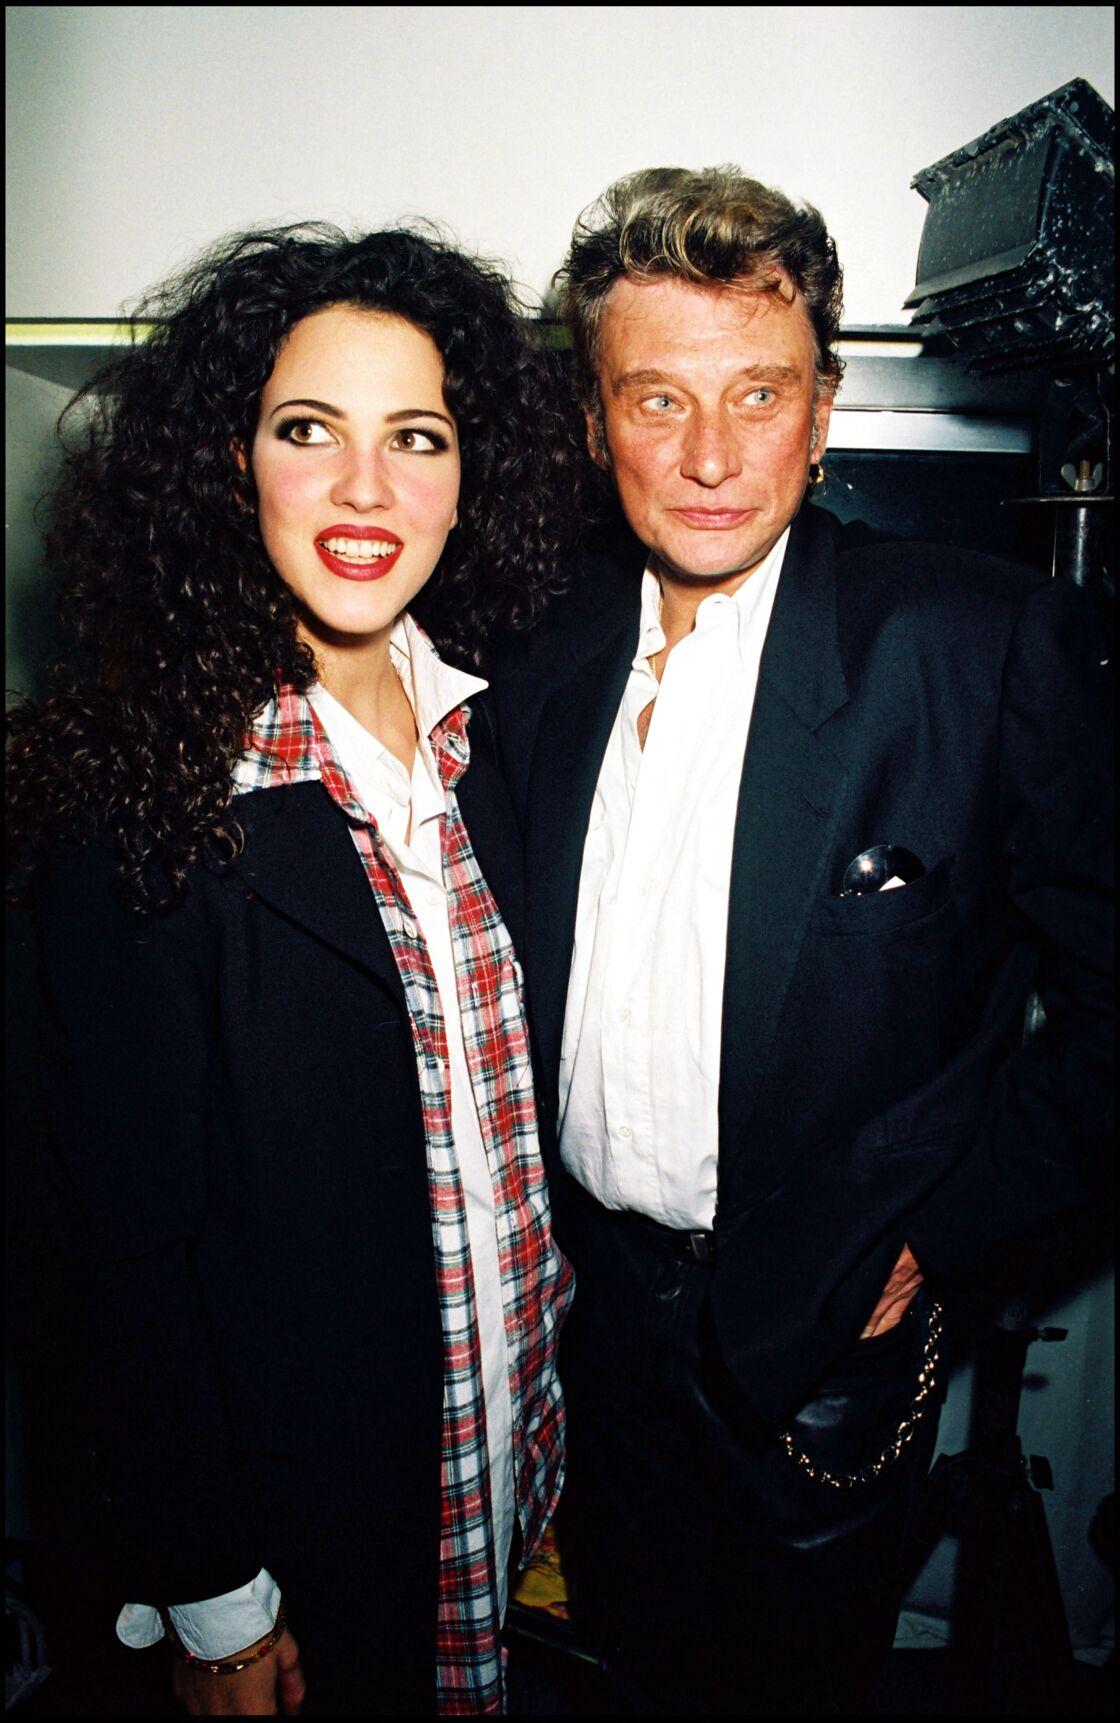 Linda Hardy et Johnny Hallyday, en backstage du défilé de mode Katoucha, en 1995.